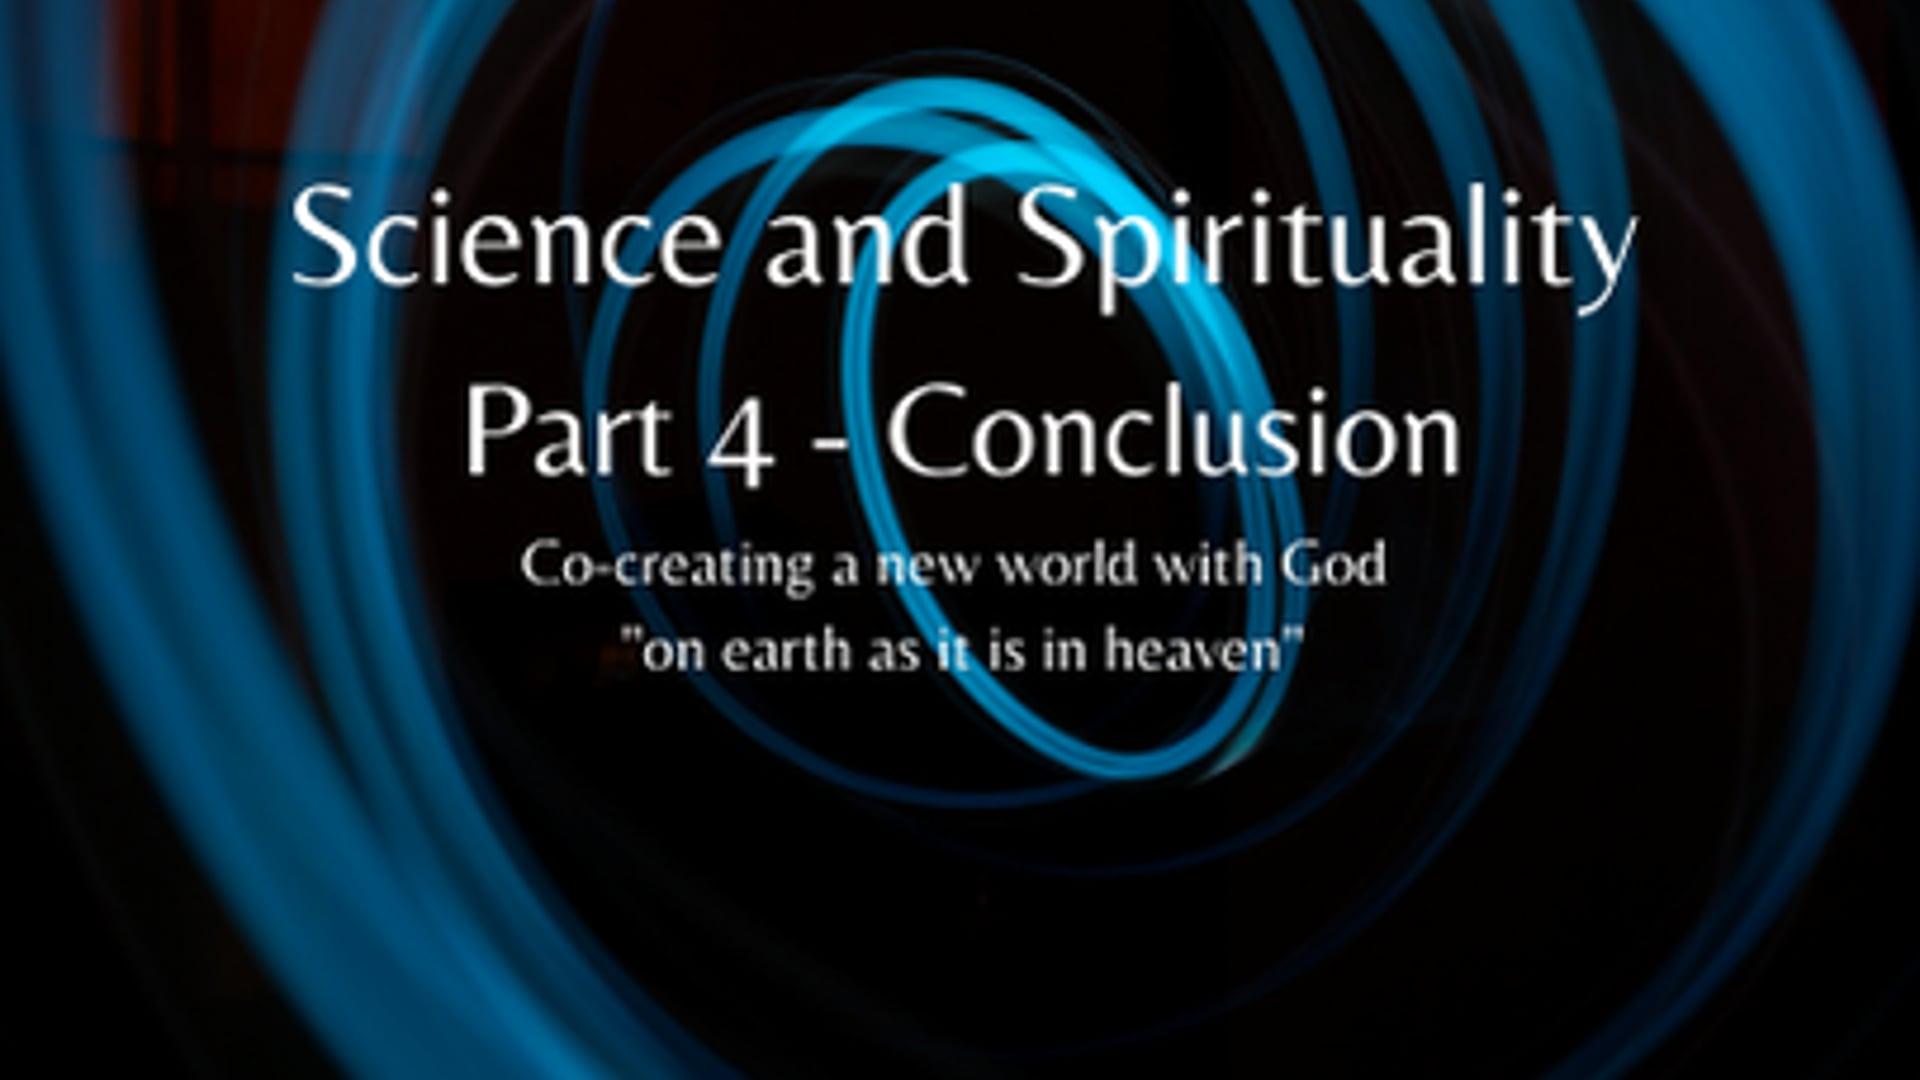 Science & Spirituality Part 4